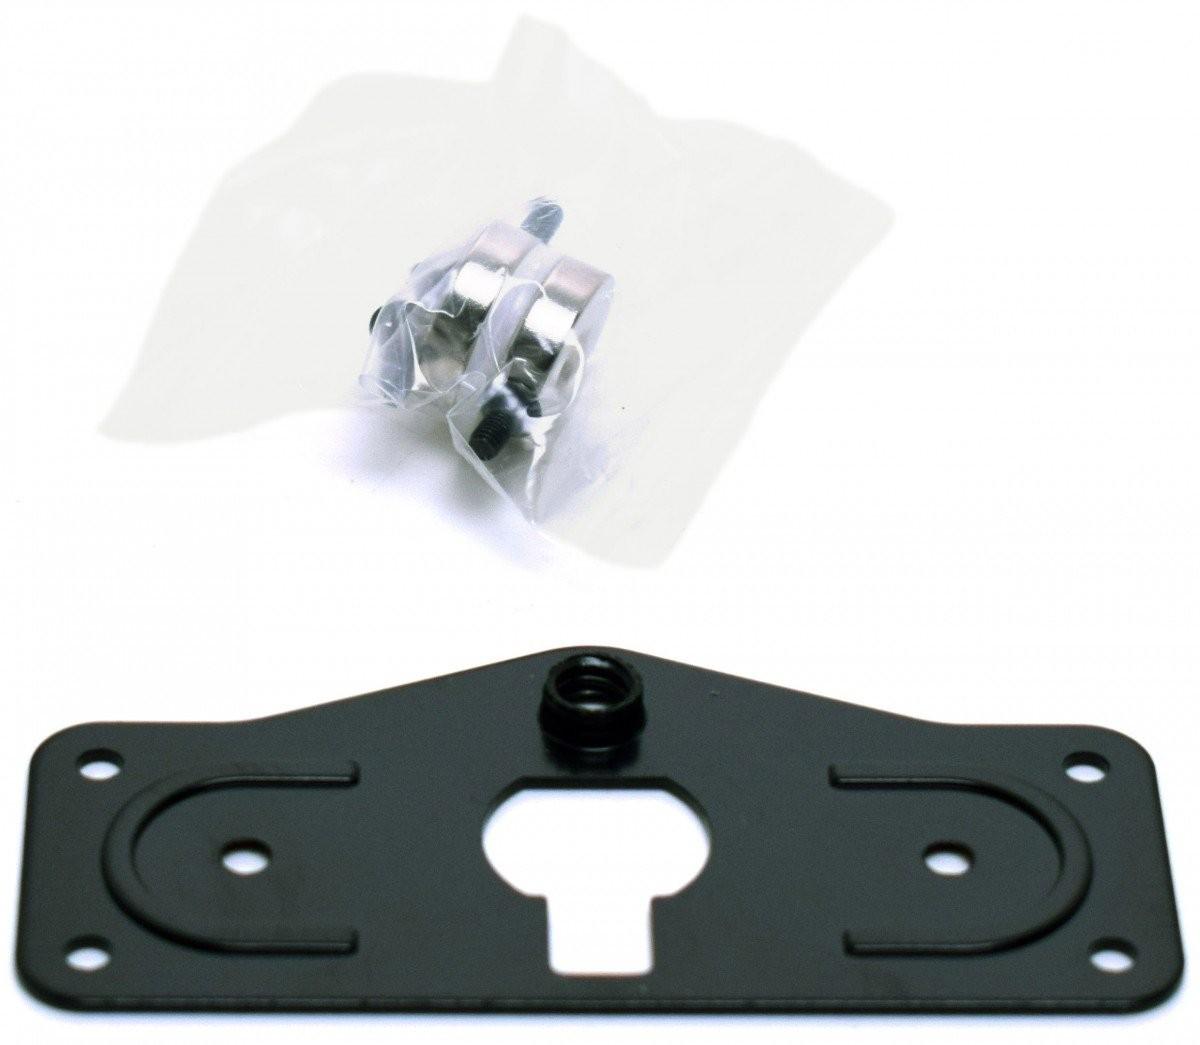 10 X Cojinete En Miniatura 635-2Z metal blindado ID 5mm Od 19mm Ancho 6mm